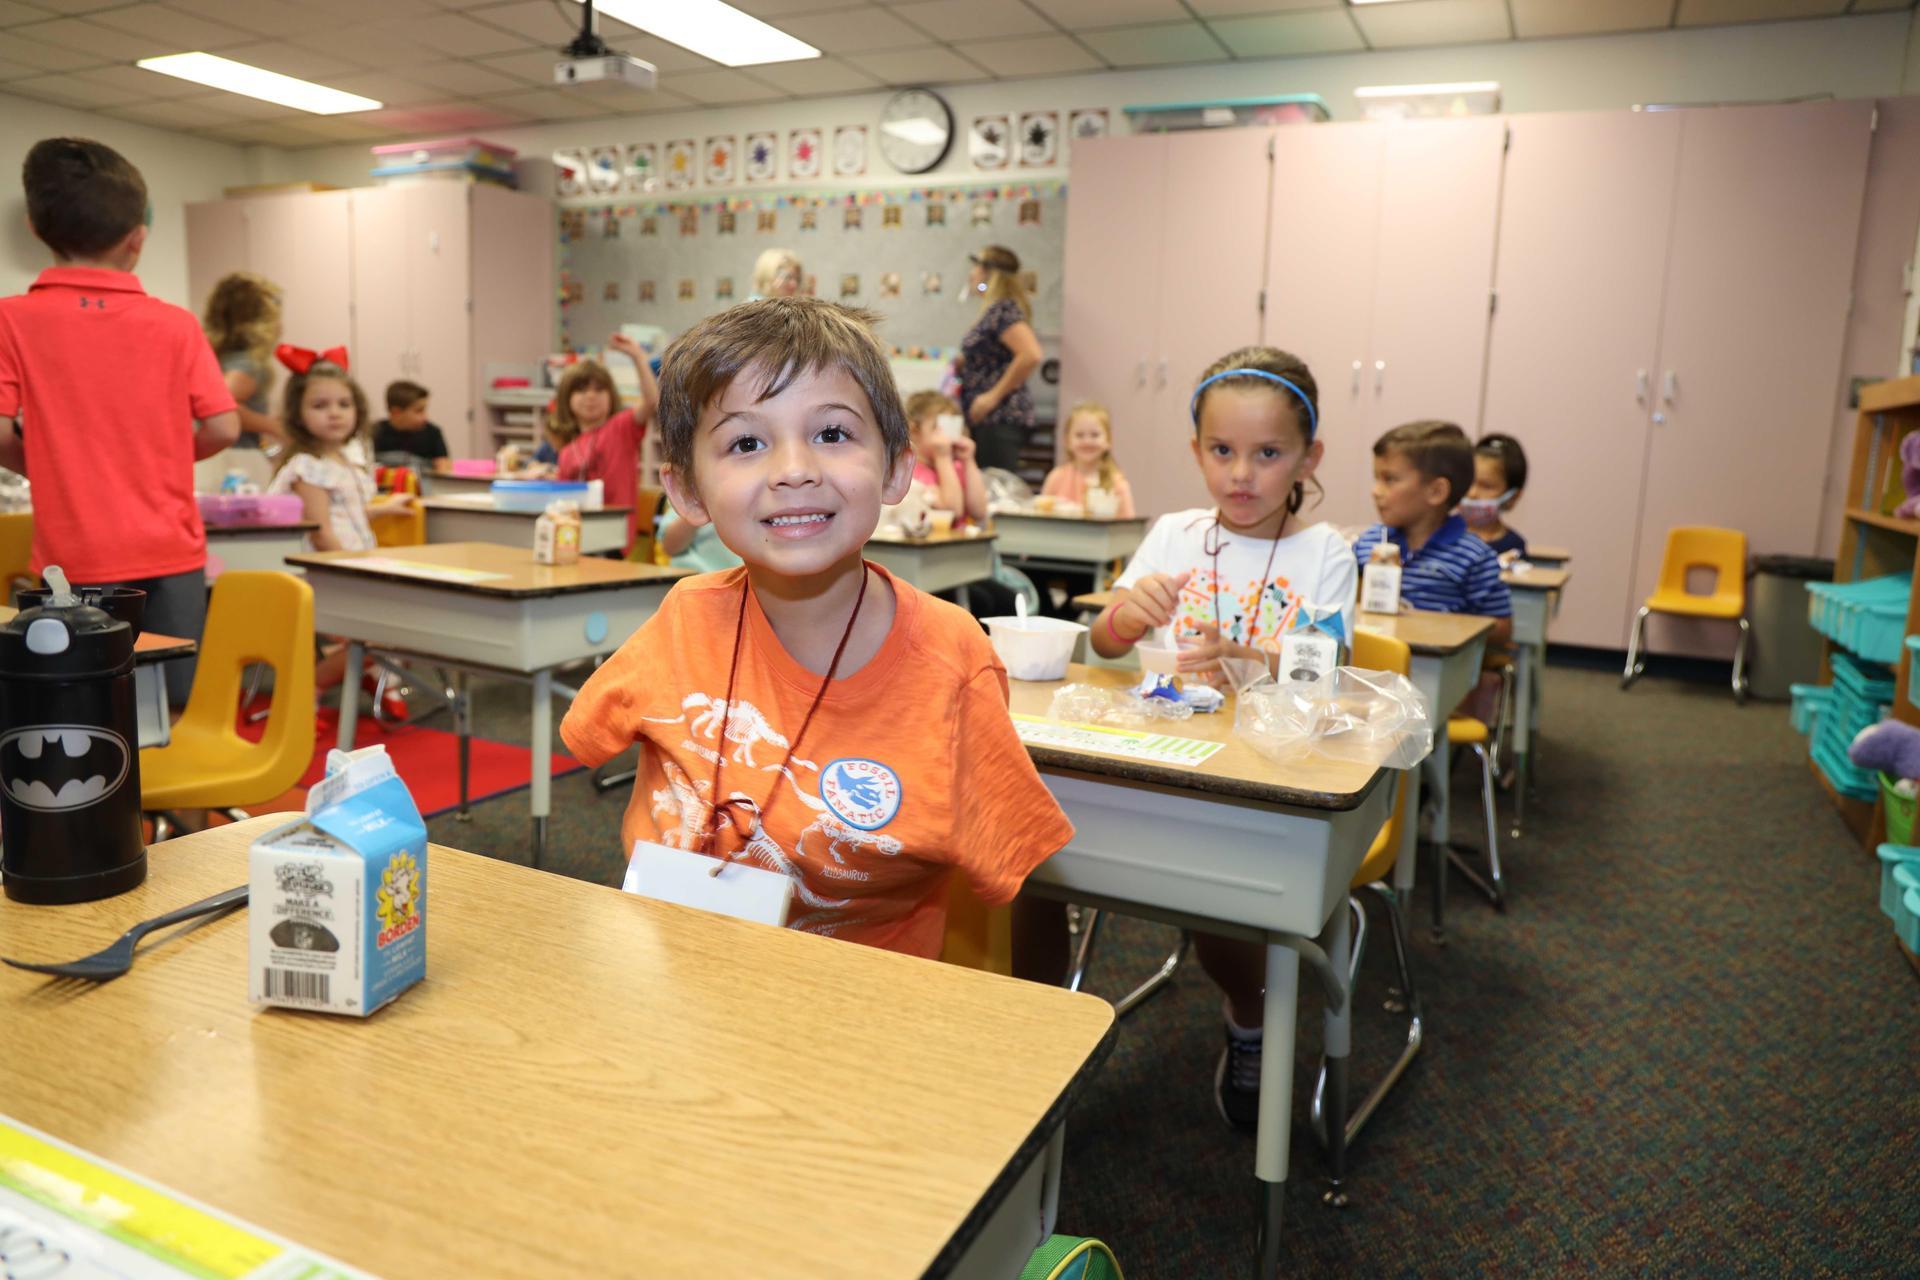 Fairmont Elementary students return to school